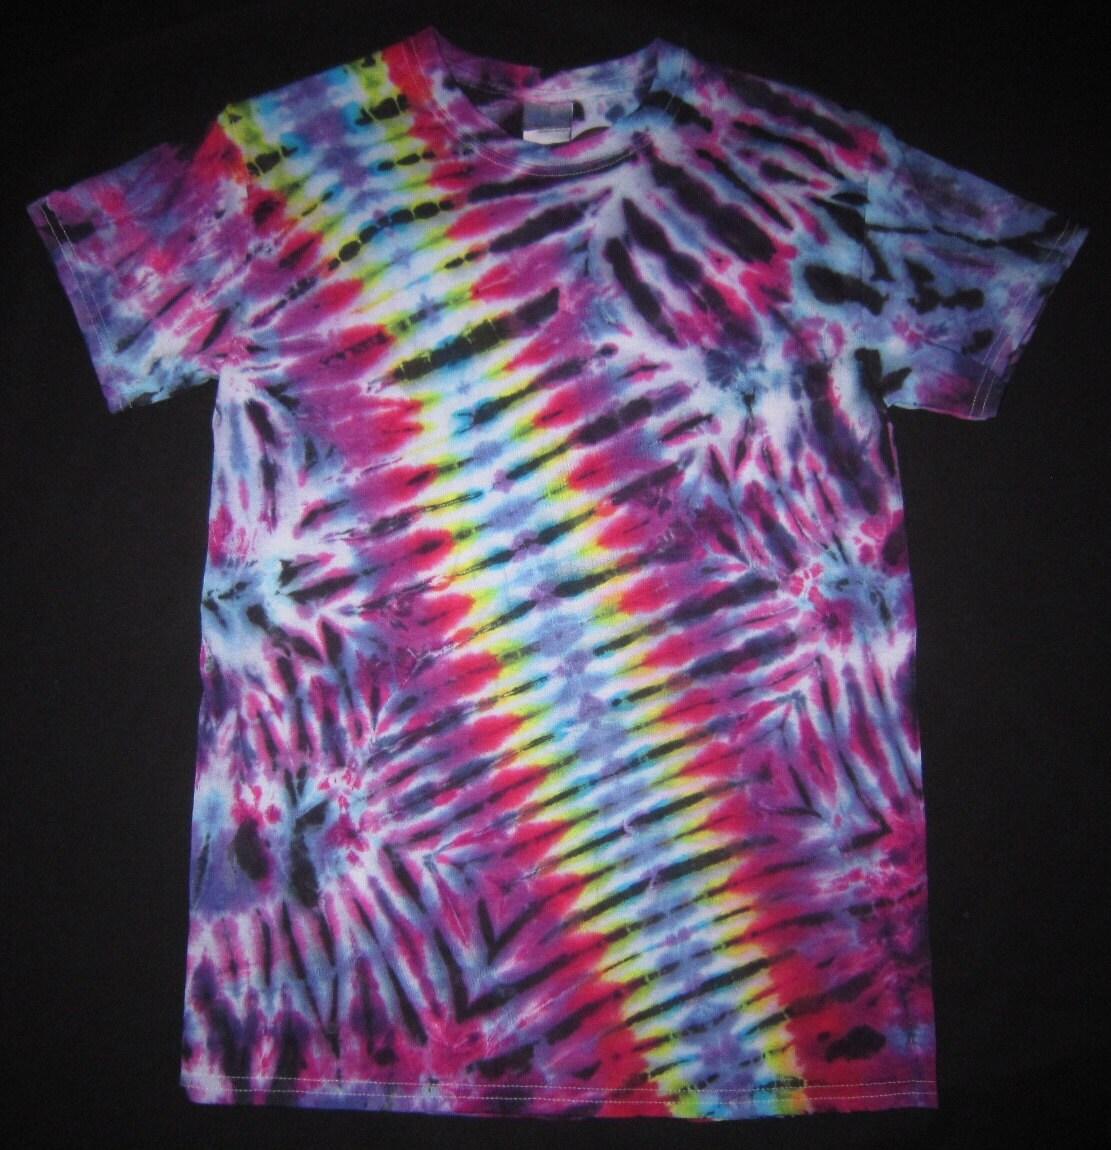 sale s29 psychedelic tie dye t shirt fits unisex